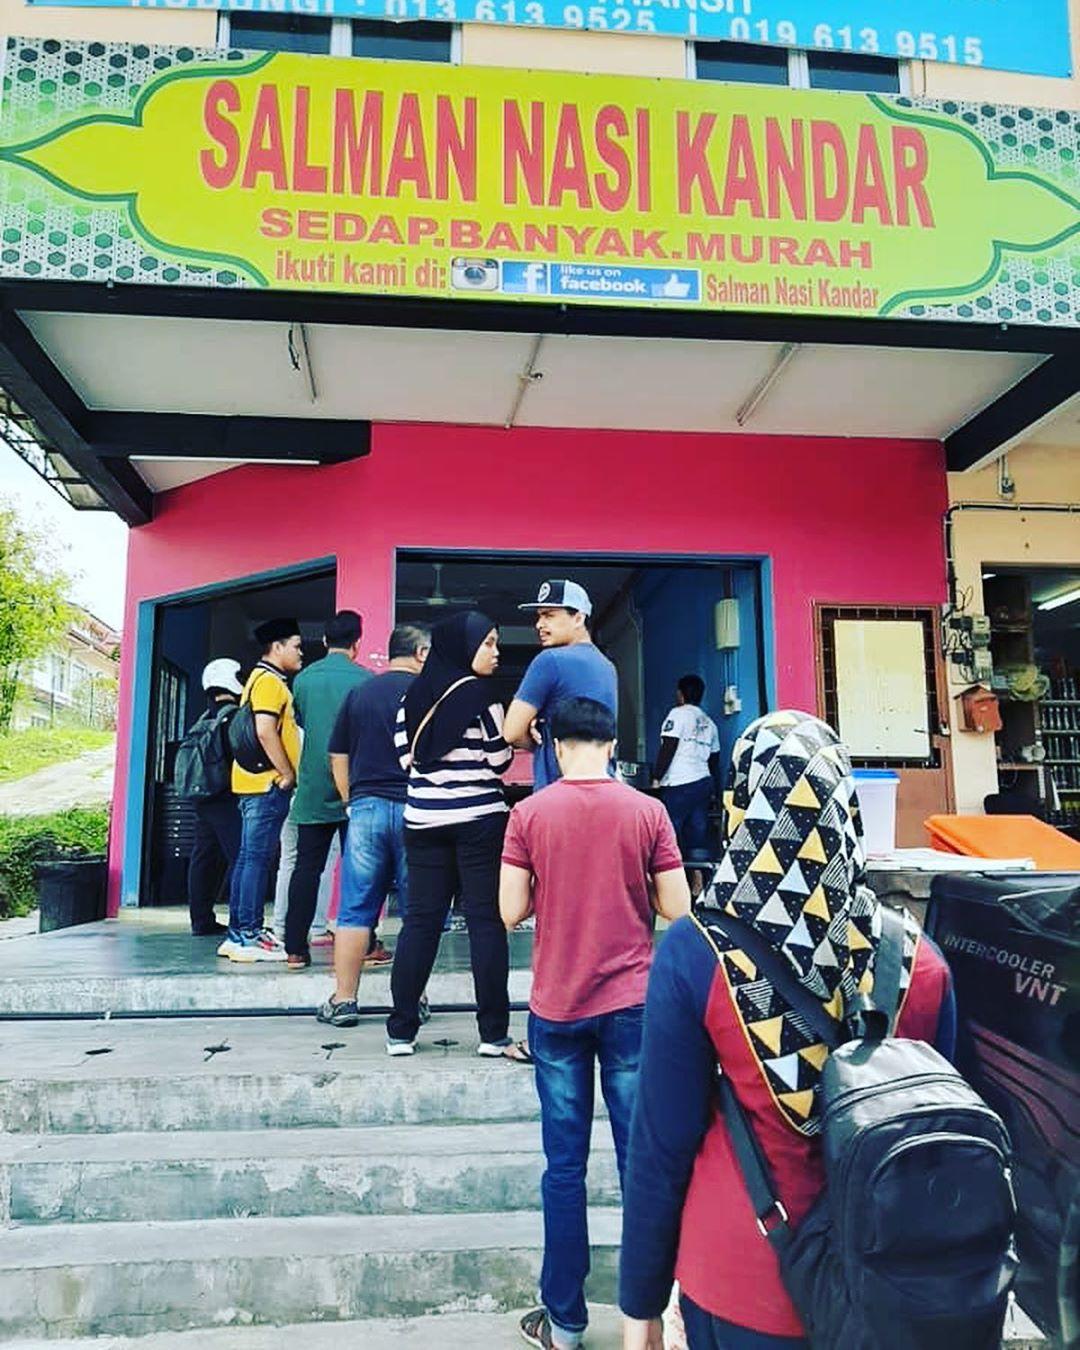 Image via Instagram @salmannasikandar